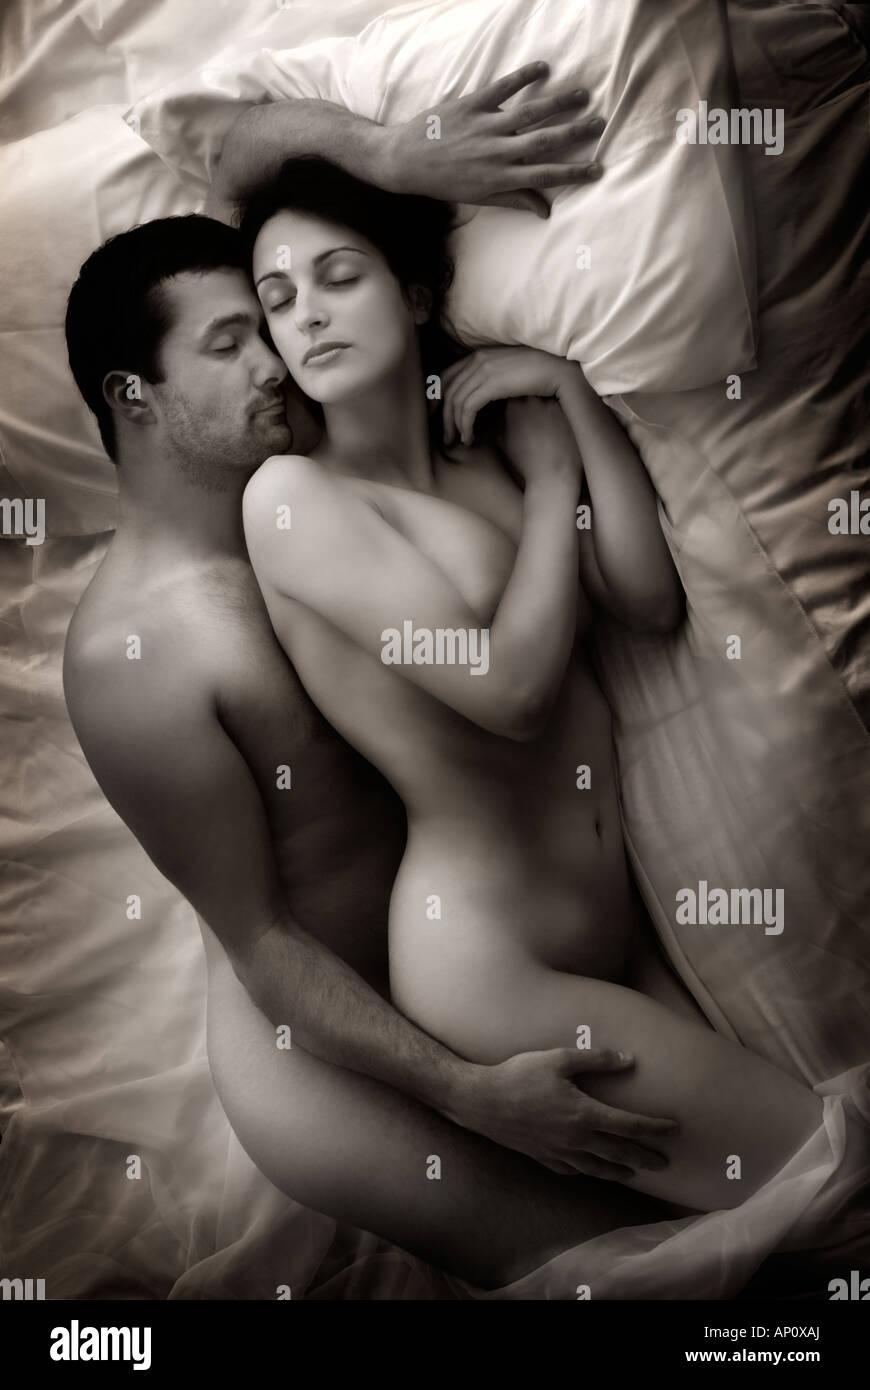 Young girl naked couple photos white